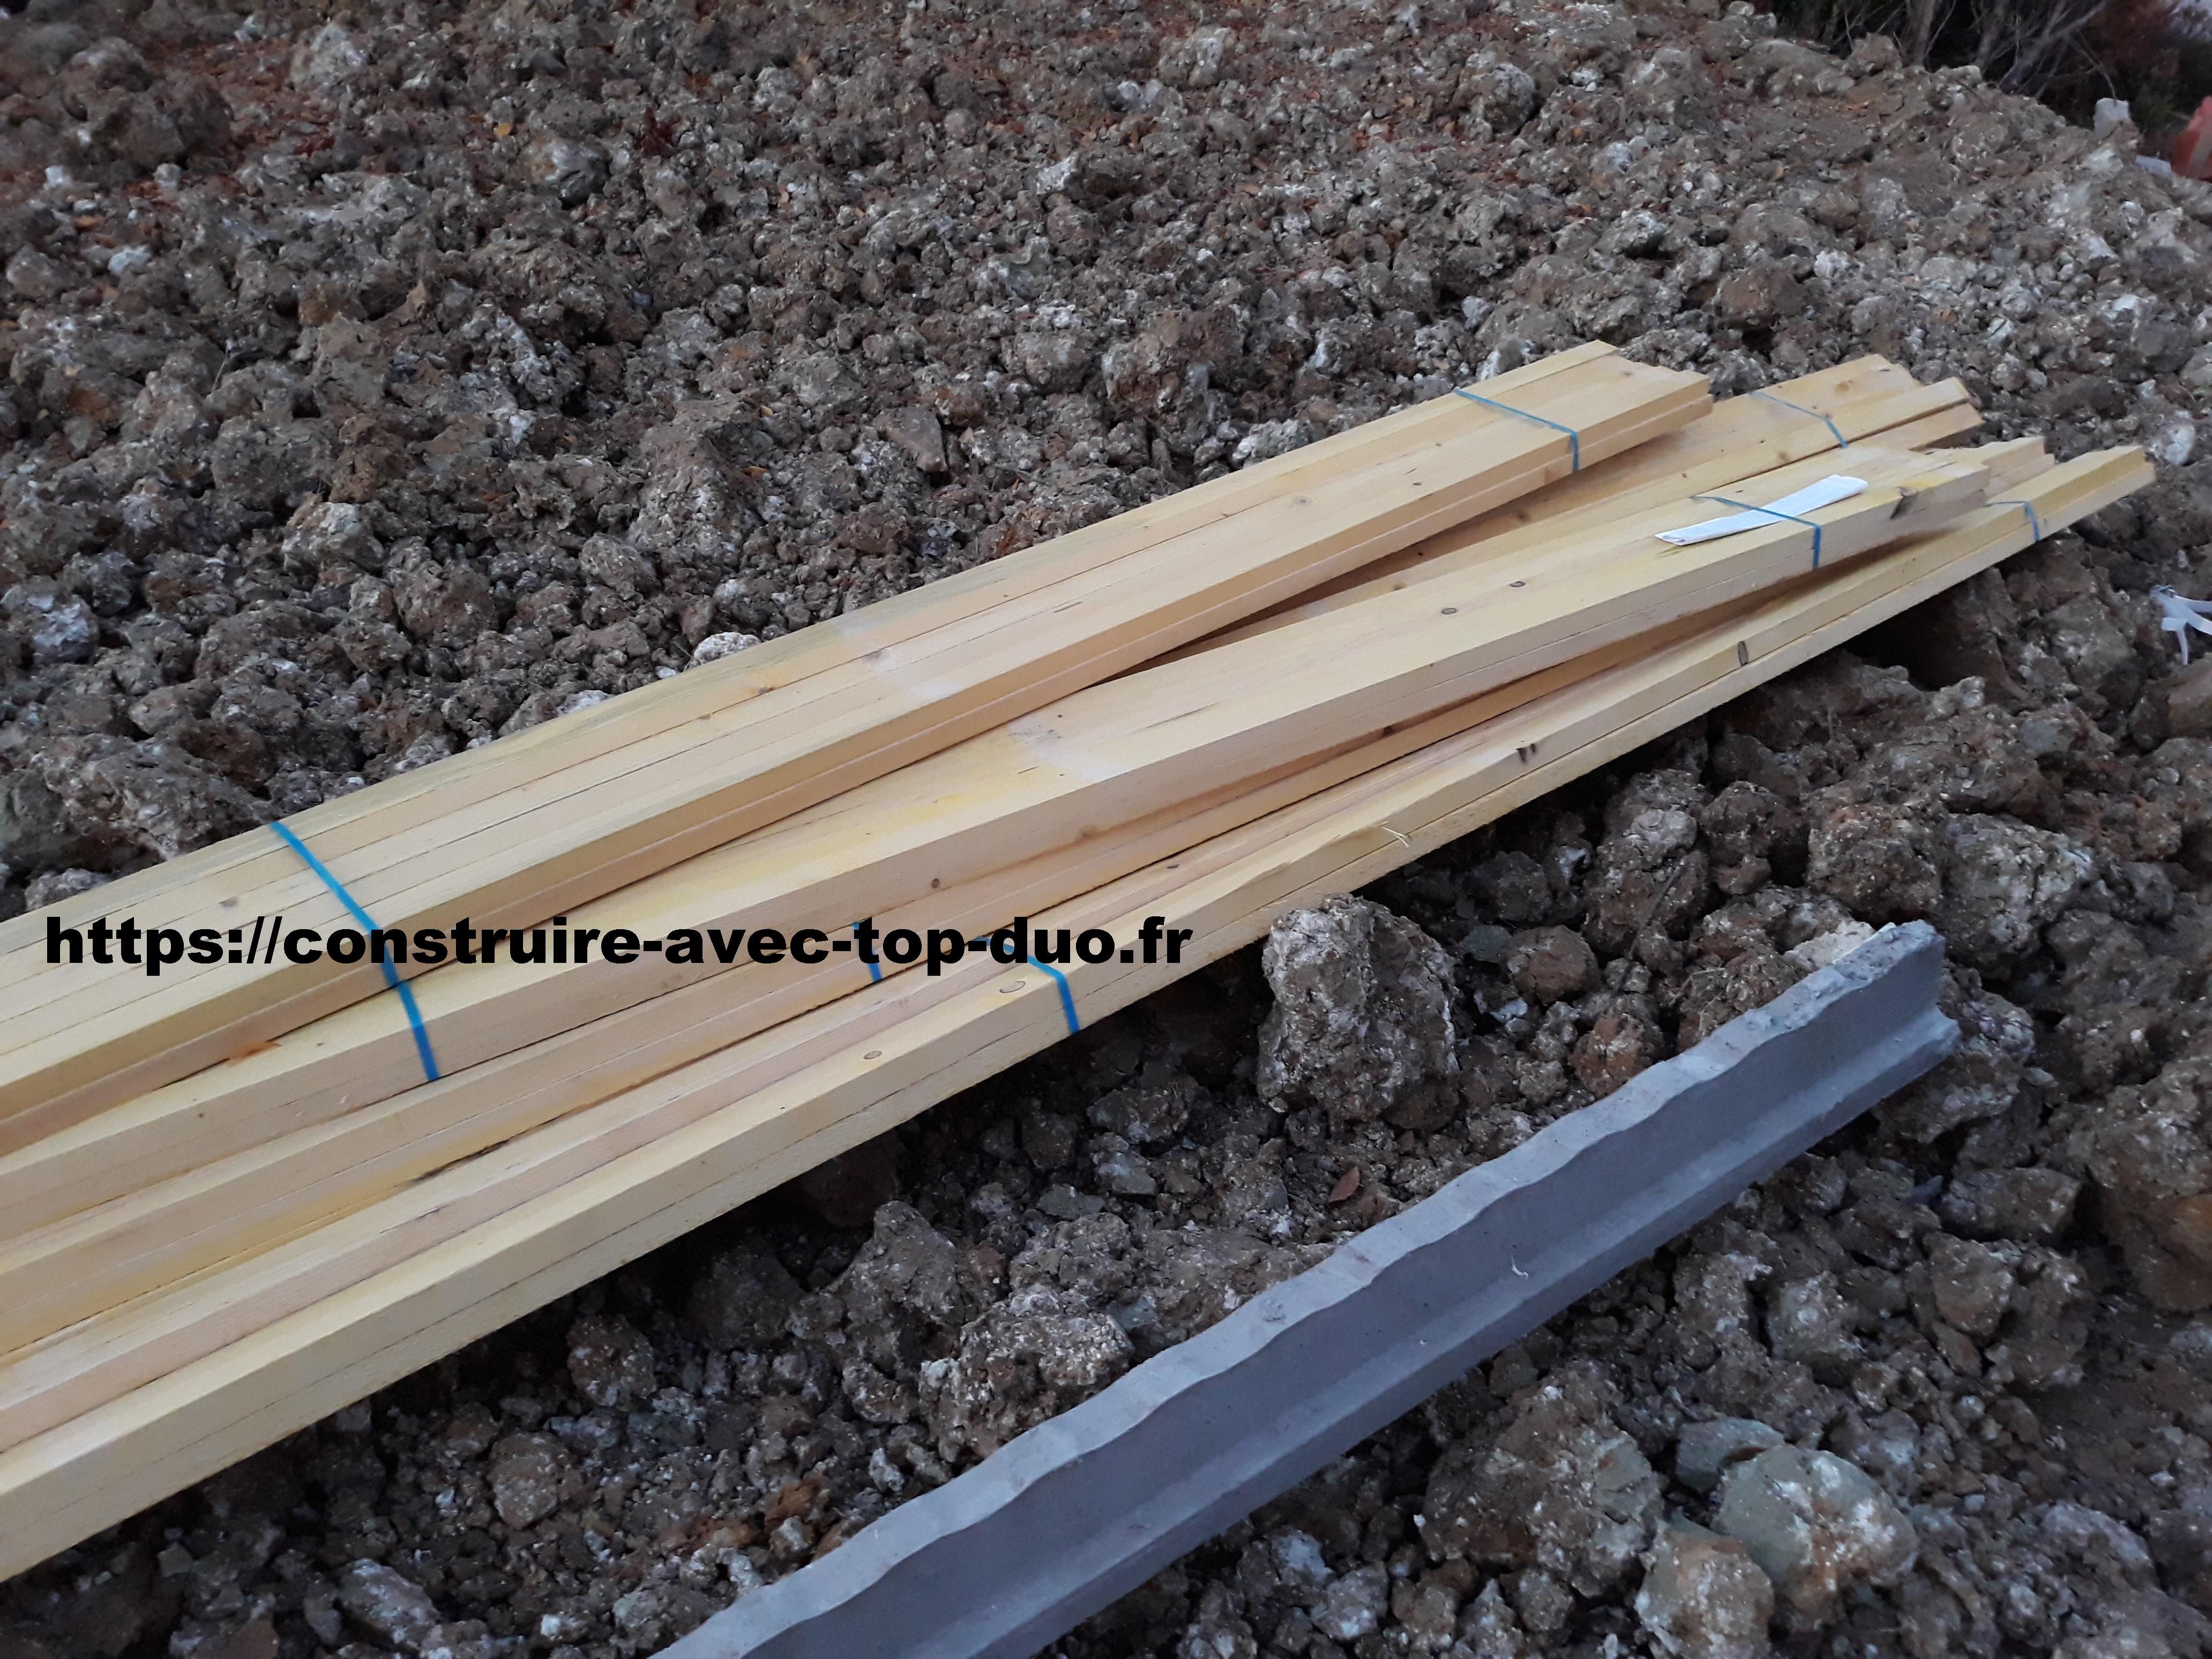 bois-charpente-chantier-ast-groupe